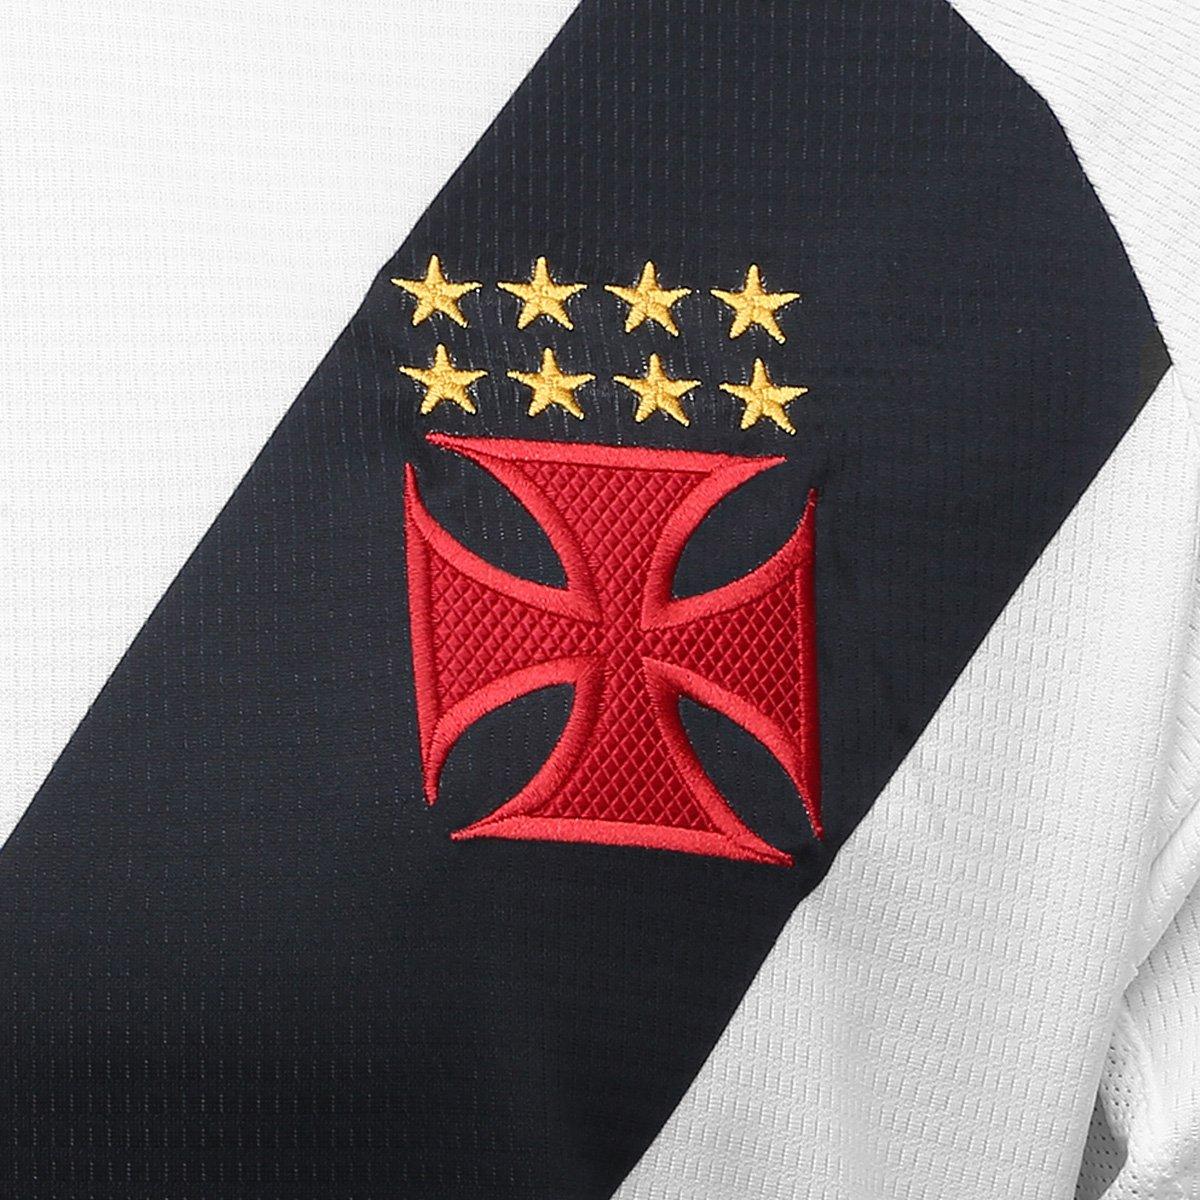 Camisa Vasco II 2018 s n° - Torcedor Diadora Masculina  310ea2b7d83c2